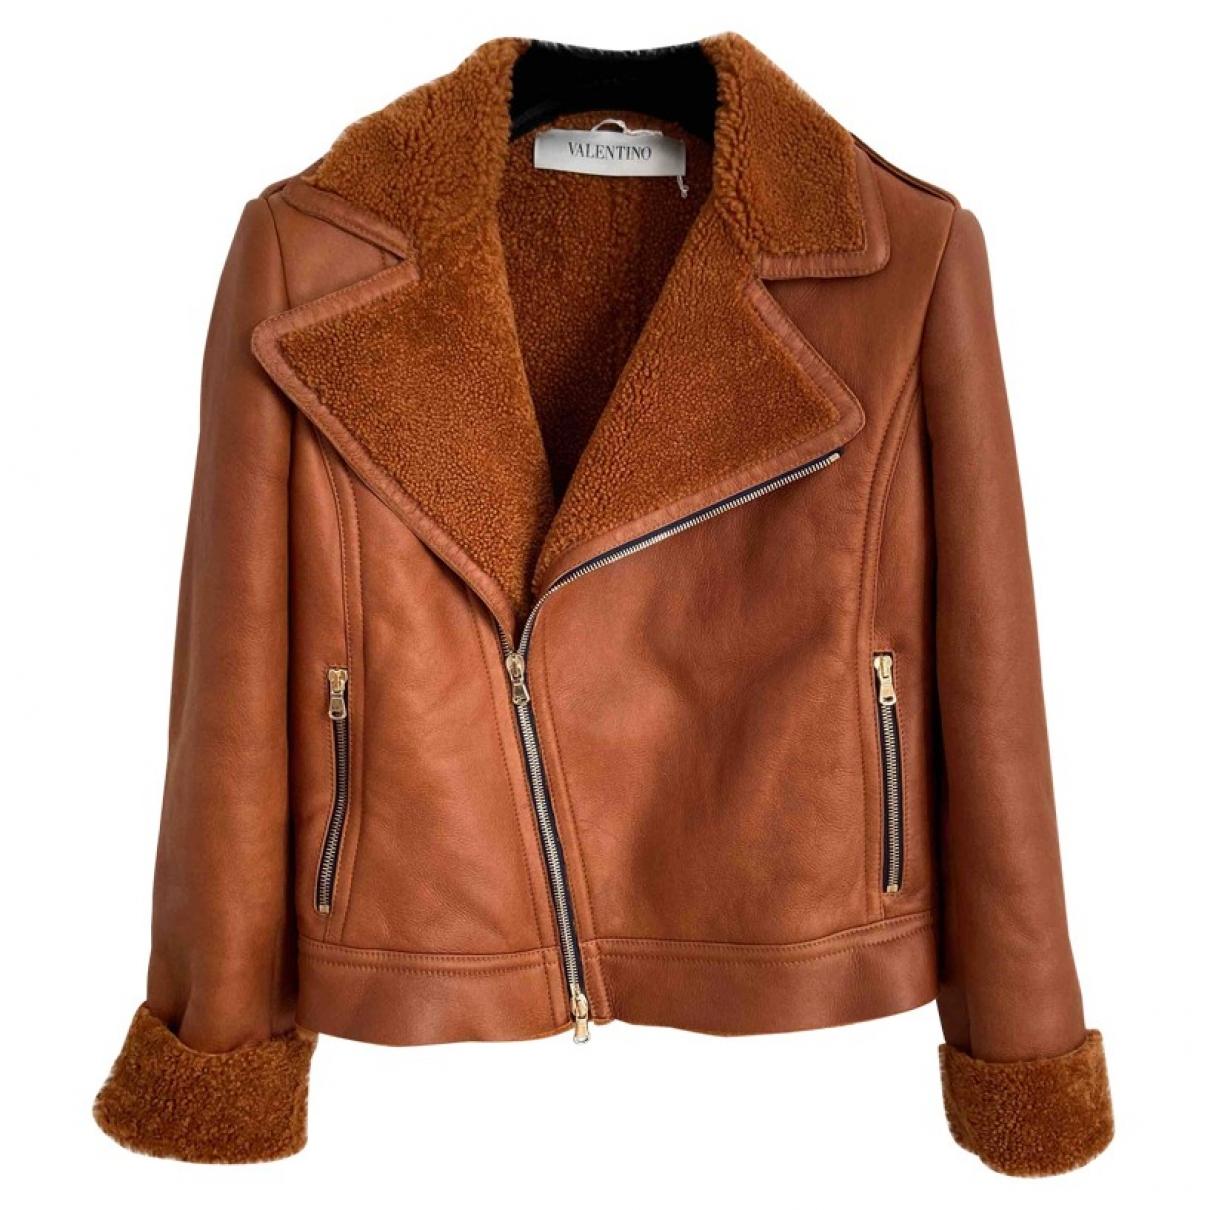 Valentino Garavani \N Brown Shearling jacket for Women 44 IT